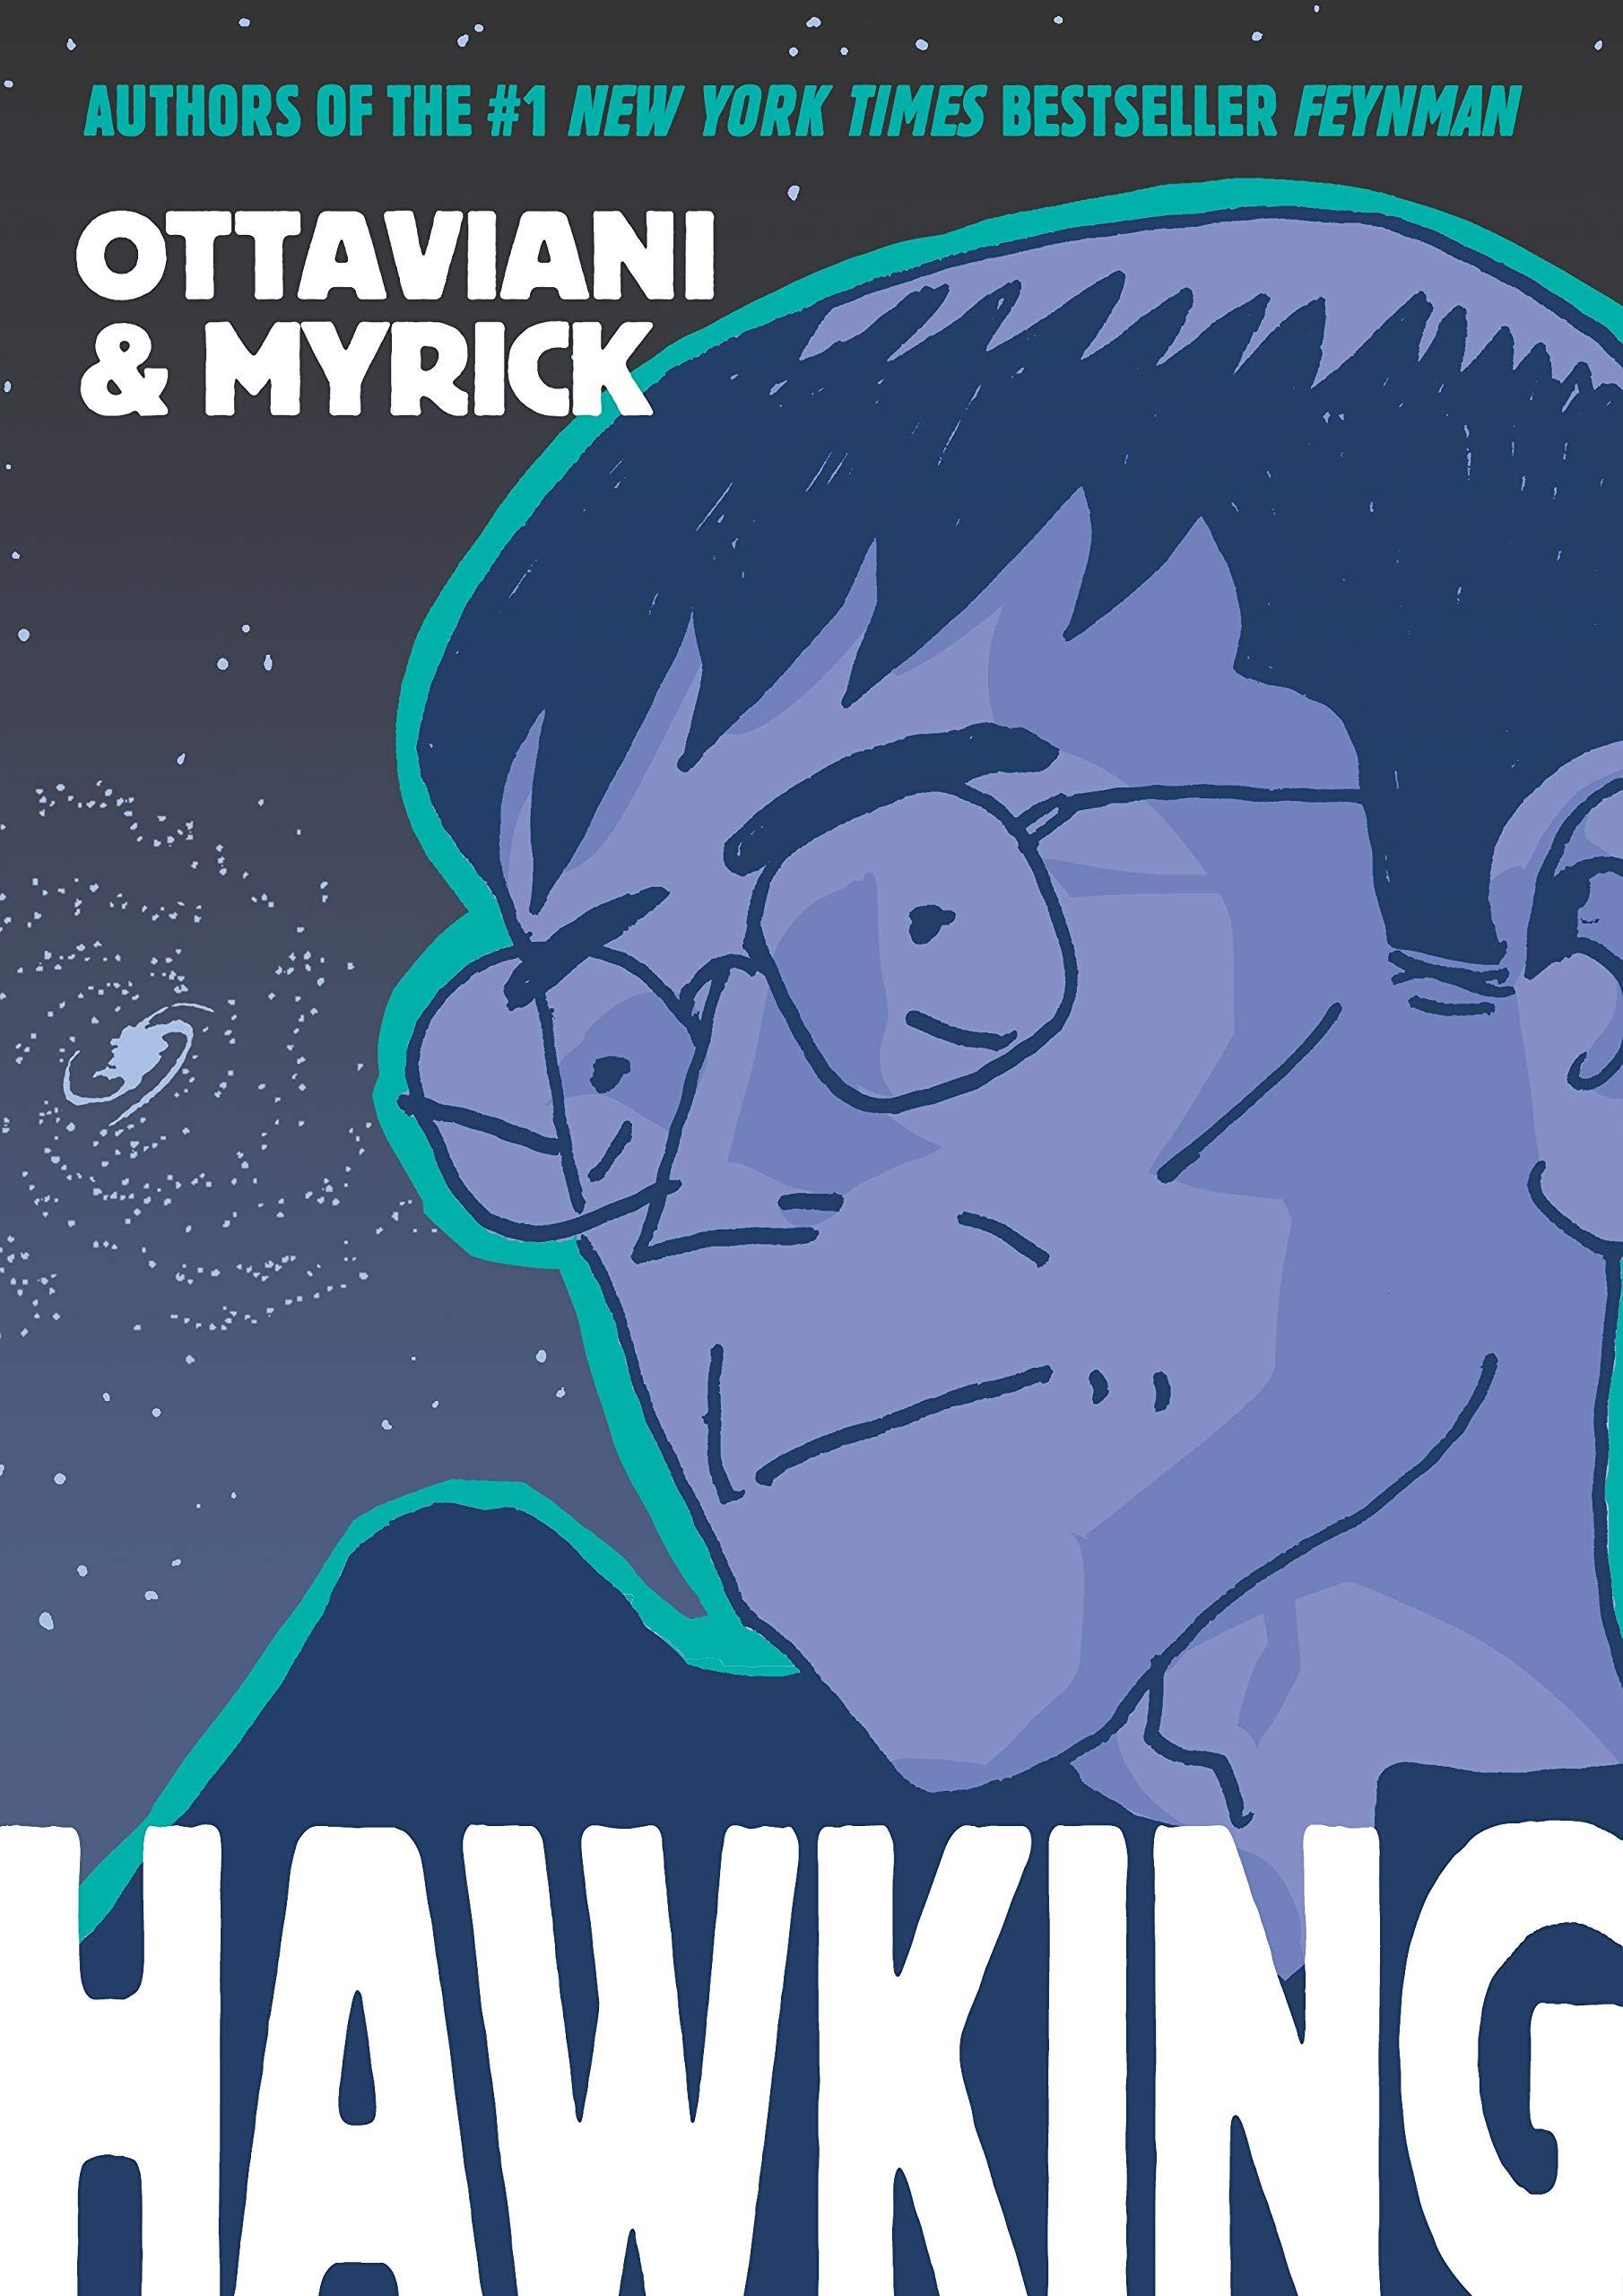 Hawking: Ottaviani, Jim, Myrick, Leland: 9781626720251: Amazon.com: Books